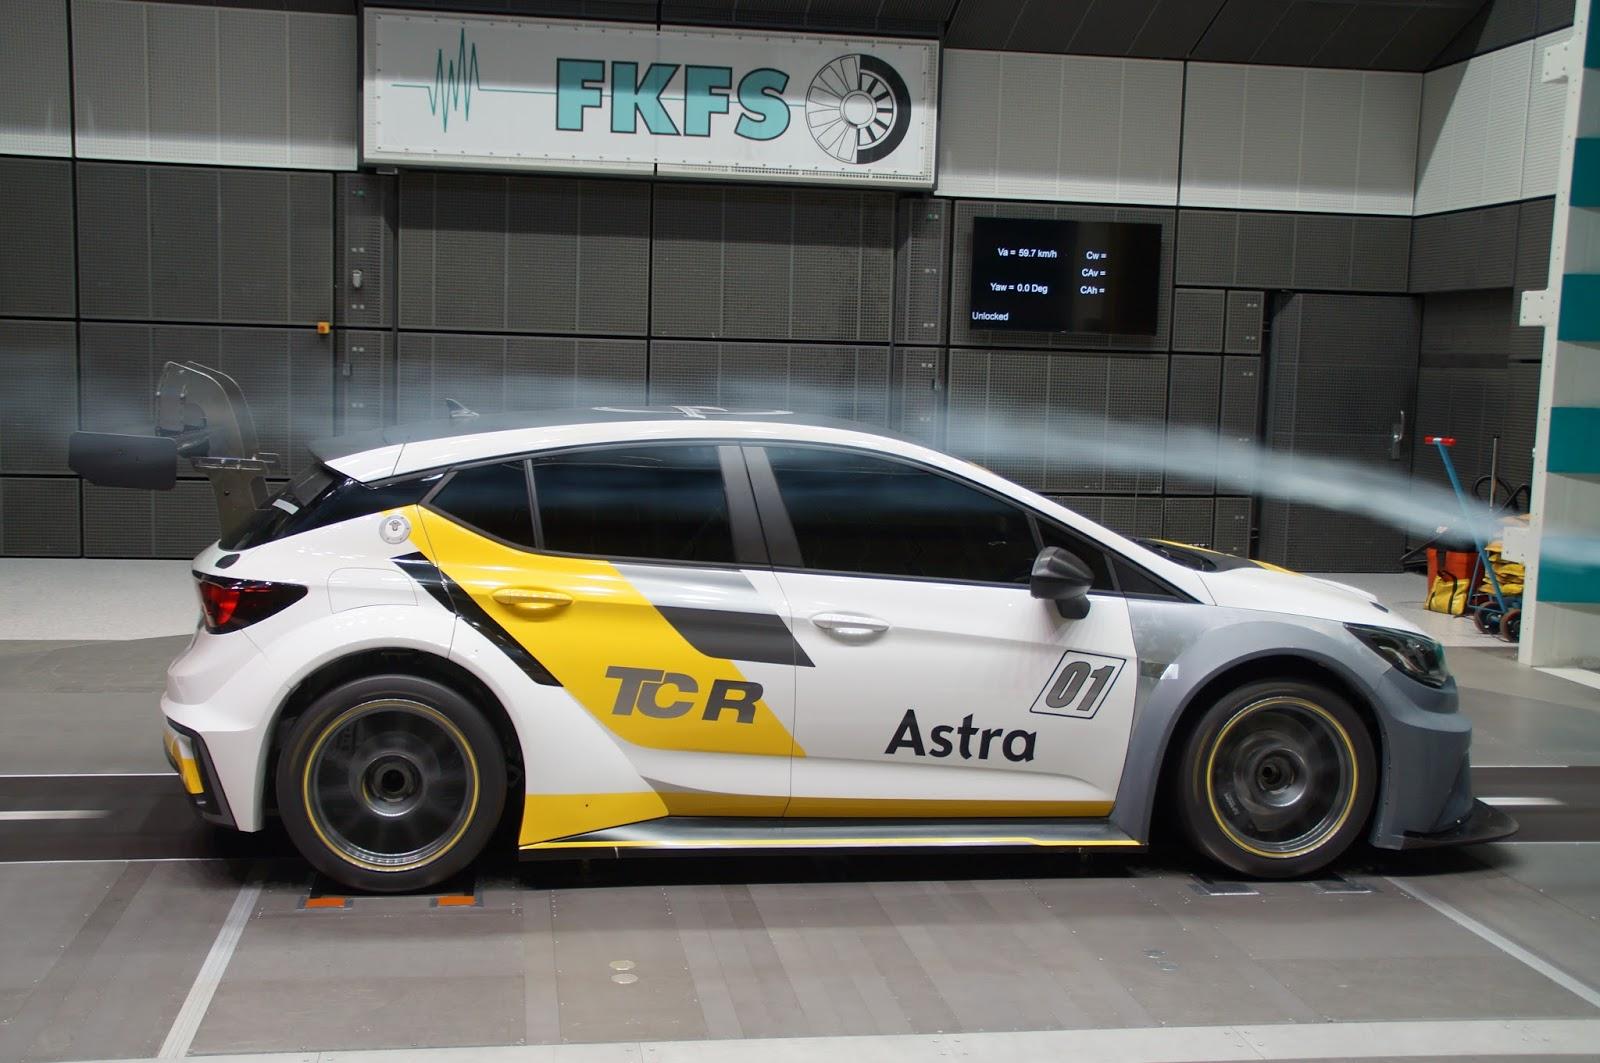 Opel Astra TCR 300280 Τελειοποιώντας την αεροδυναμική του Astra Opel, Opel Astra, Opel Astra TCR, Rally, Τεχνολογία